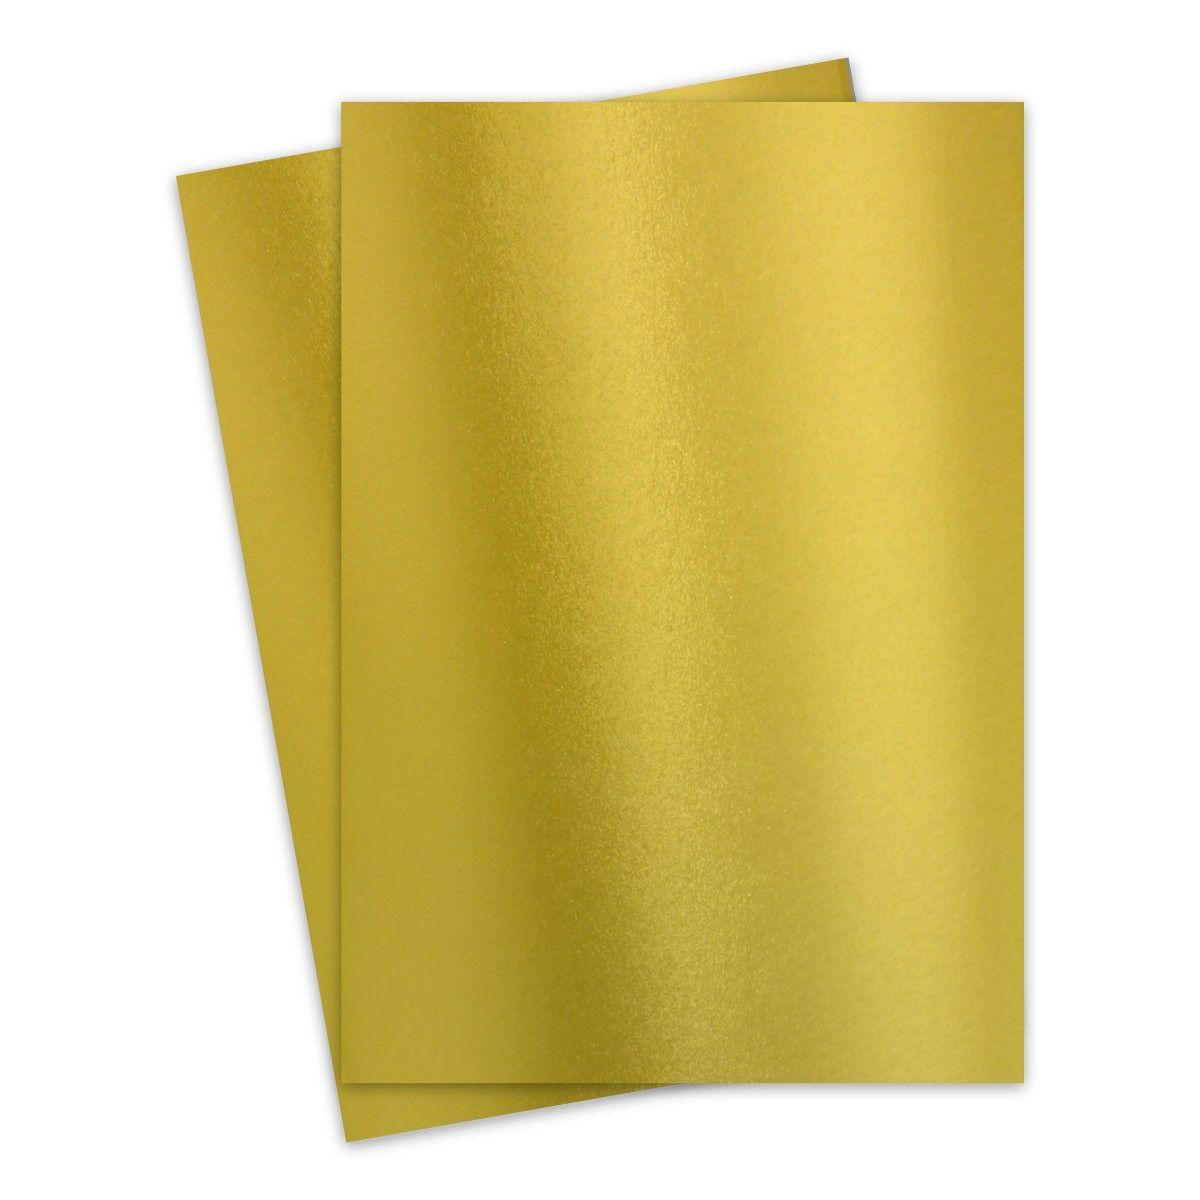 Fav Shimmer Premium Gold 8 5 X 14 Legal Size Card Stock Paper 92lb Cover 250gsm 150 Pk Metallic Paper Legal Size Paper Shimmer Paper